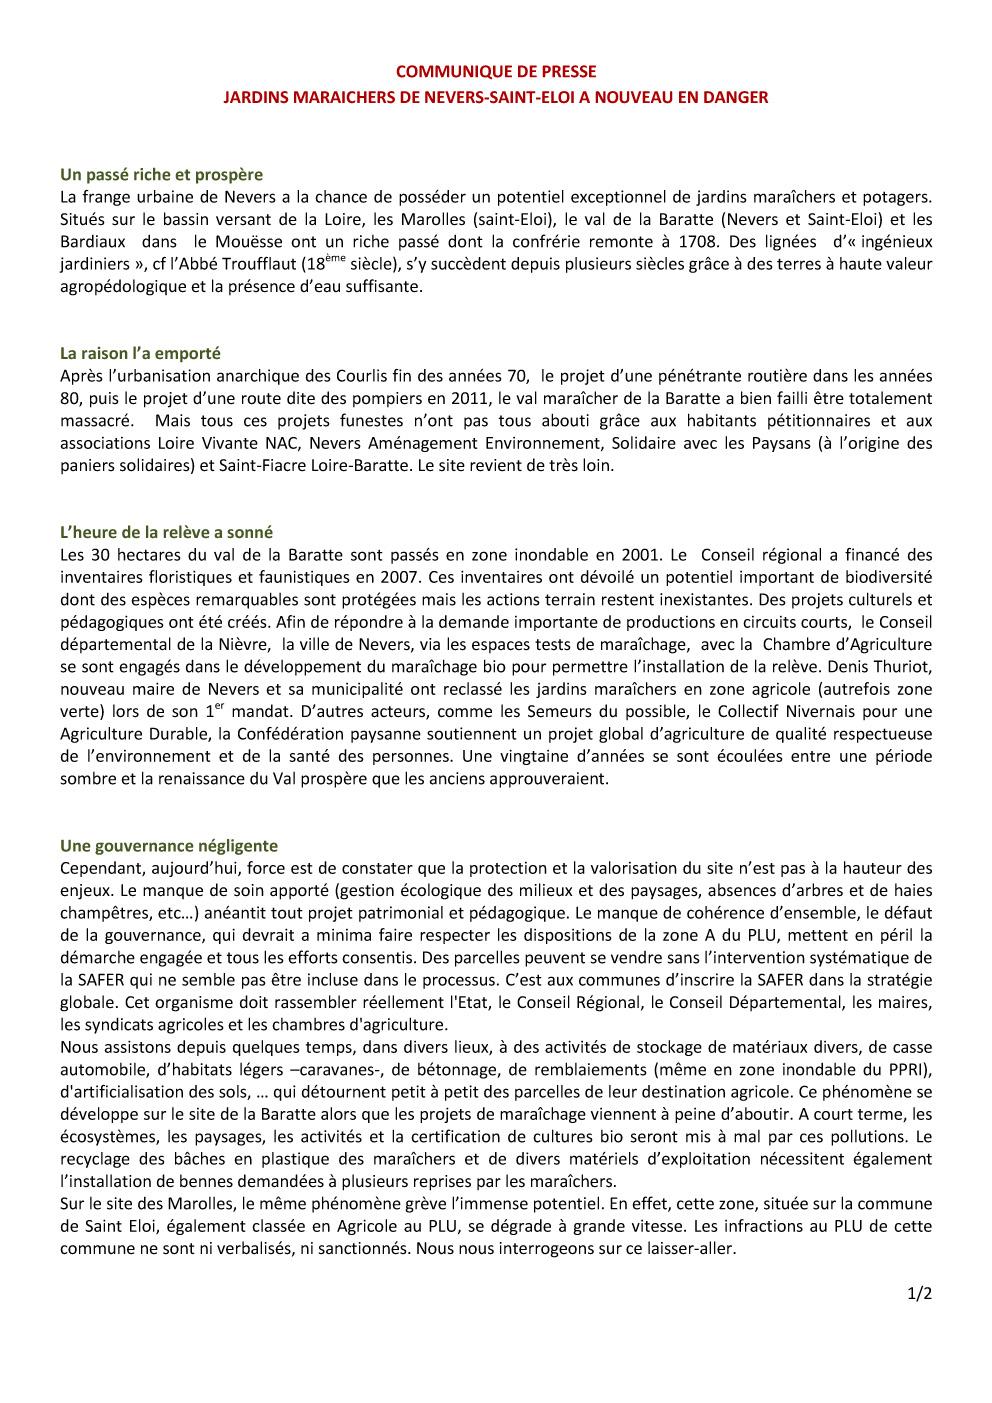 BARATTE-2020-COMMUNIQUE DE PRESSE VFINALE1.jpg